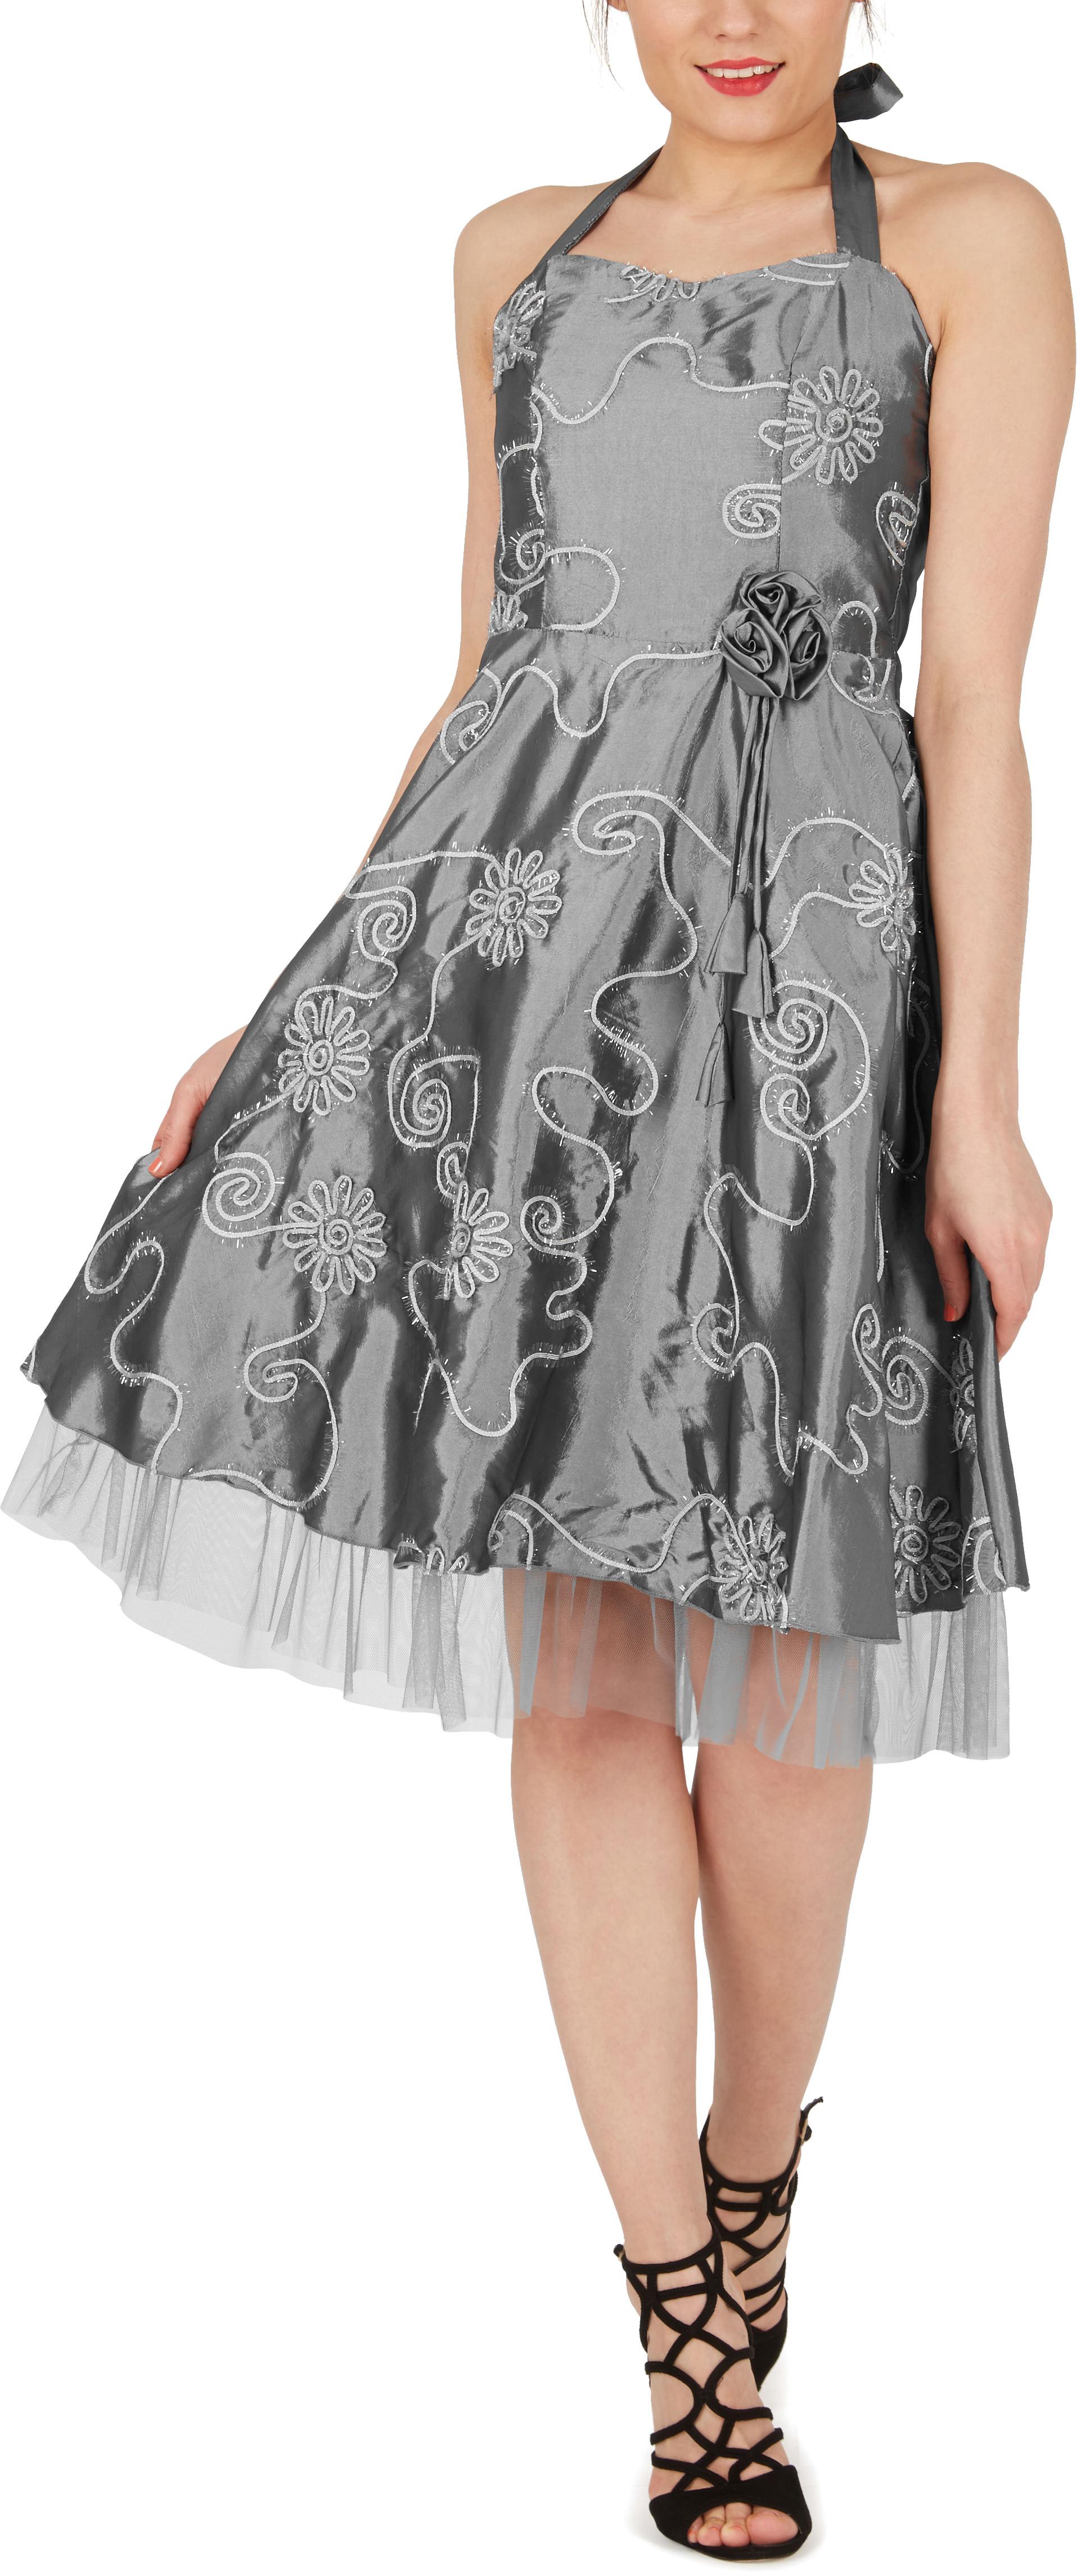 /'Rita/' Floral Cherish Bridesmaid 50s 60s Rockabilly Vintage Swing Prom Dress